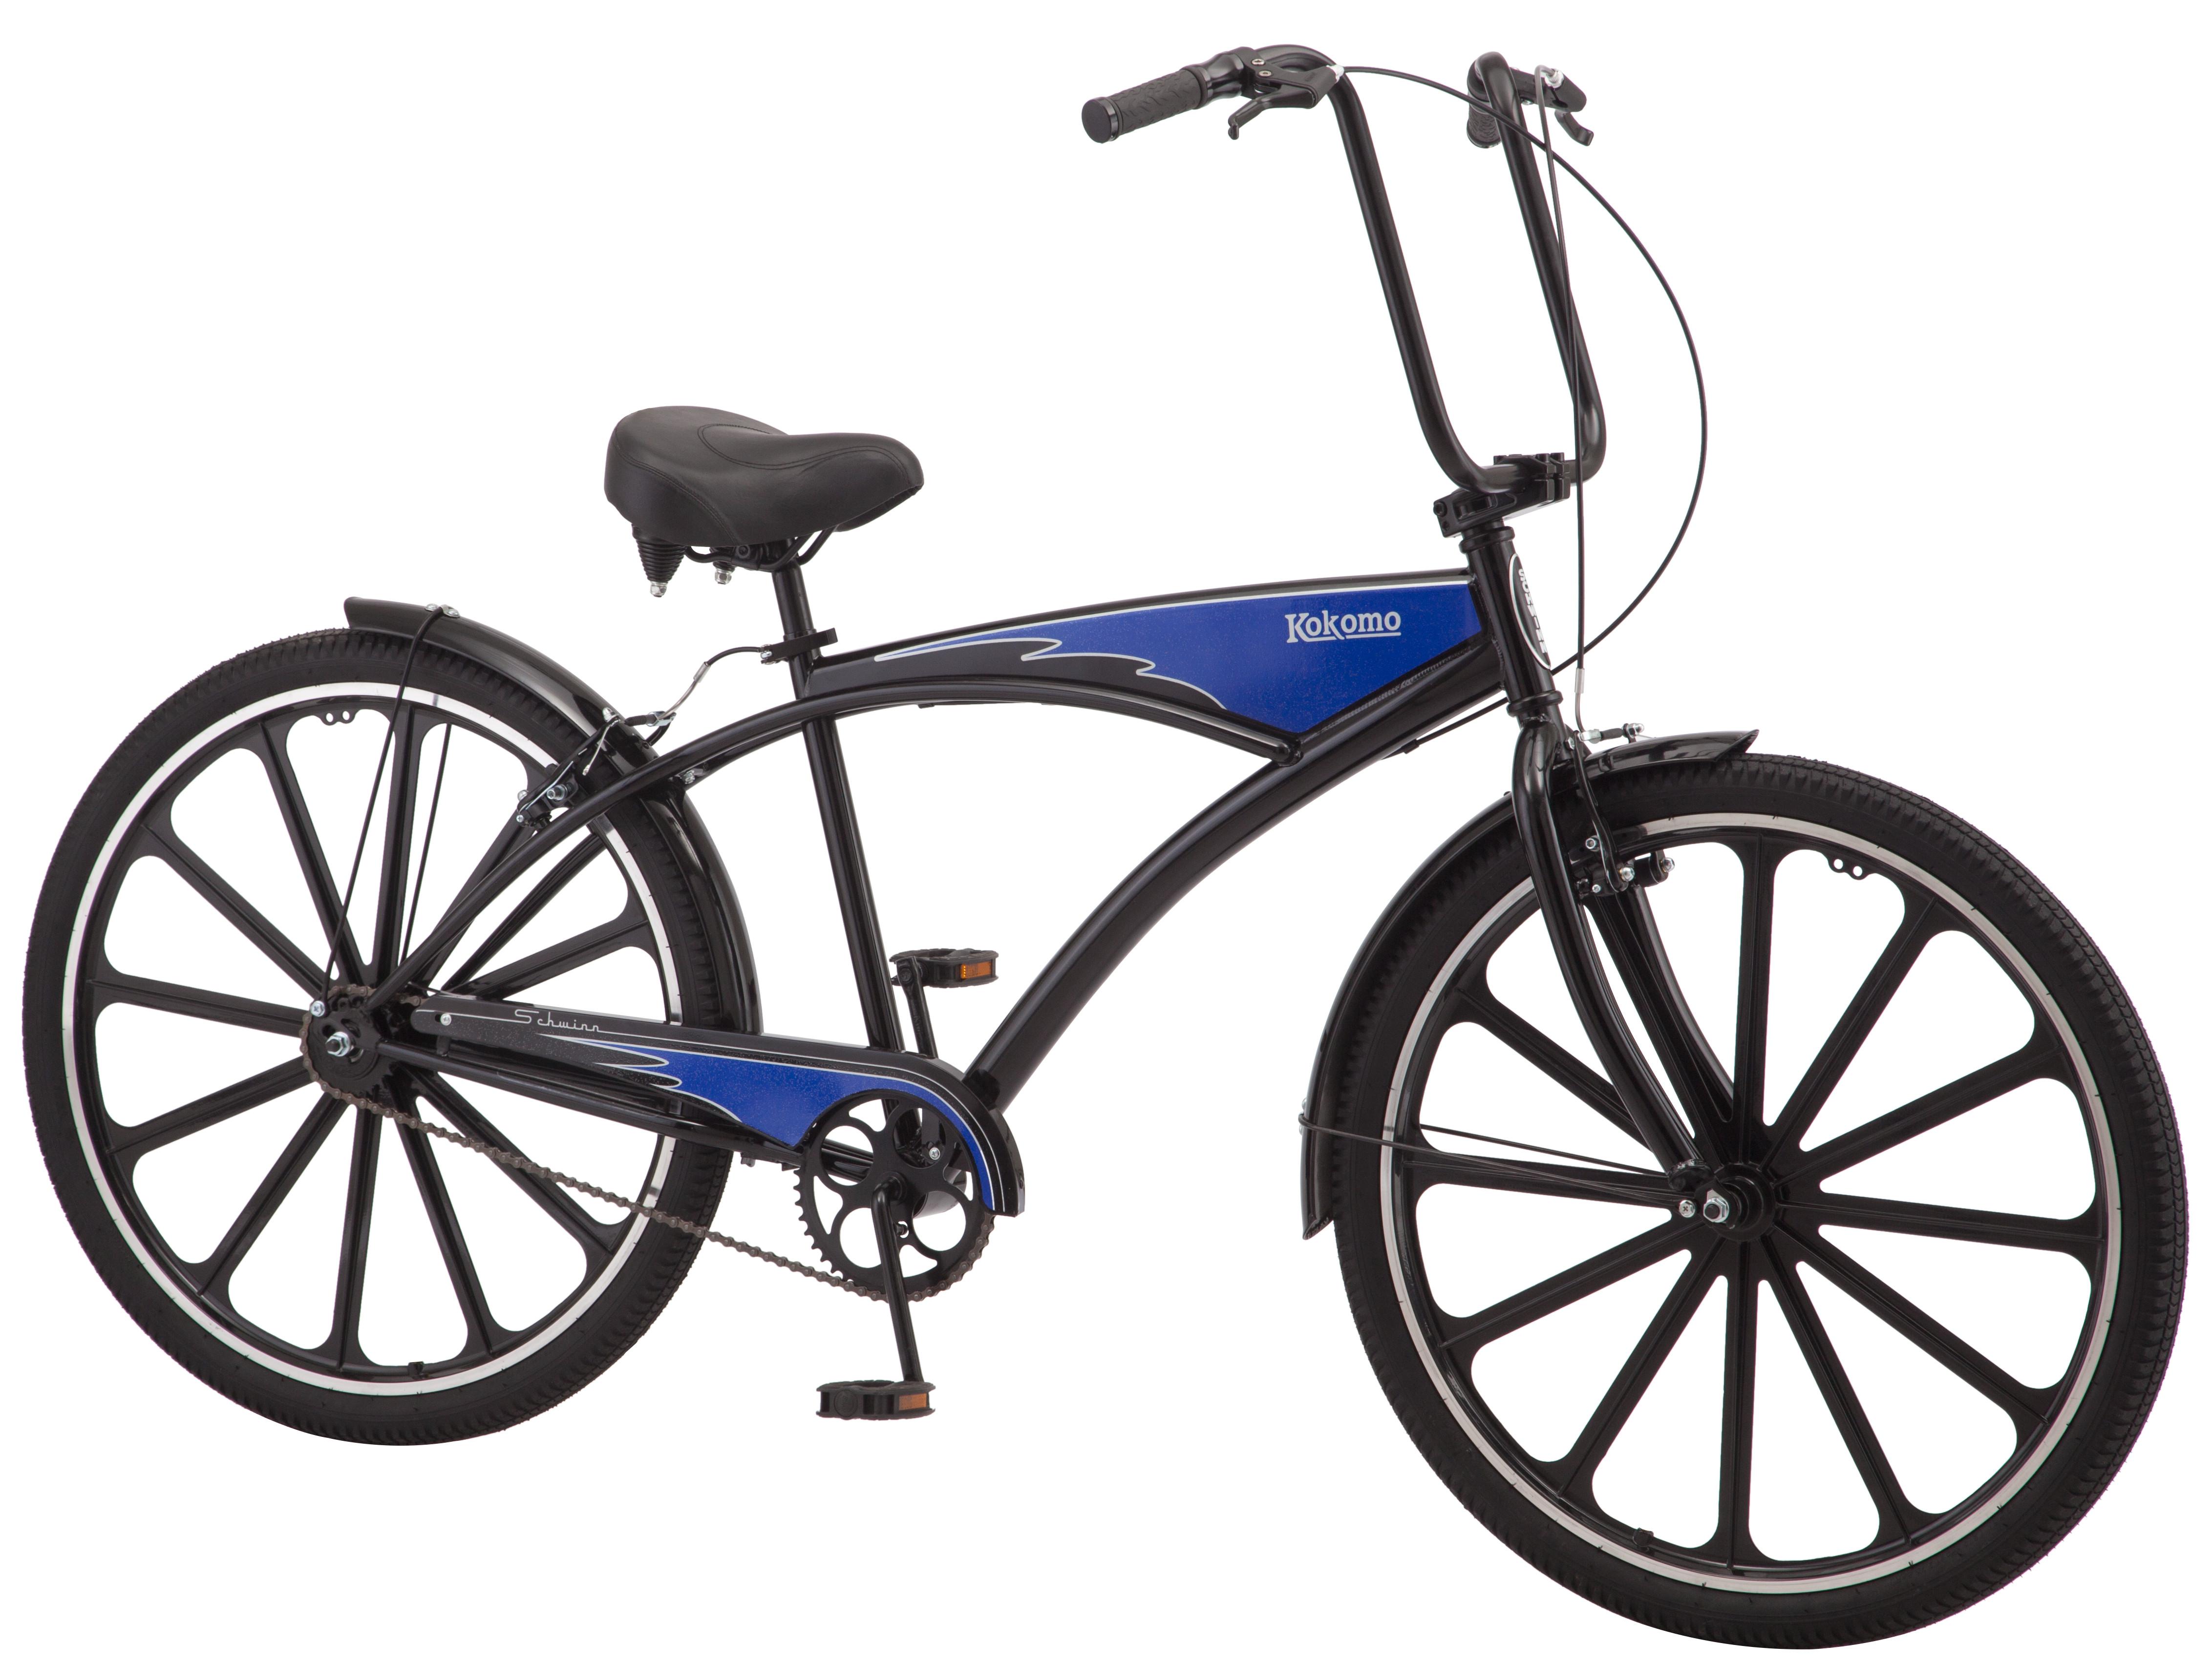 "Schwinn Kokomo Cruiser Bike, 27.5"" wheels, single speed for men $149"